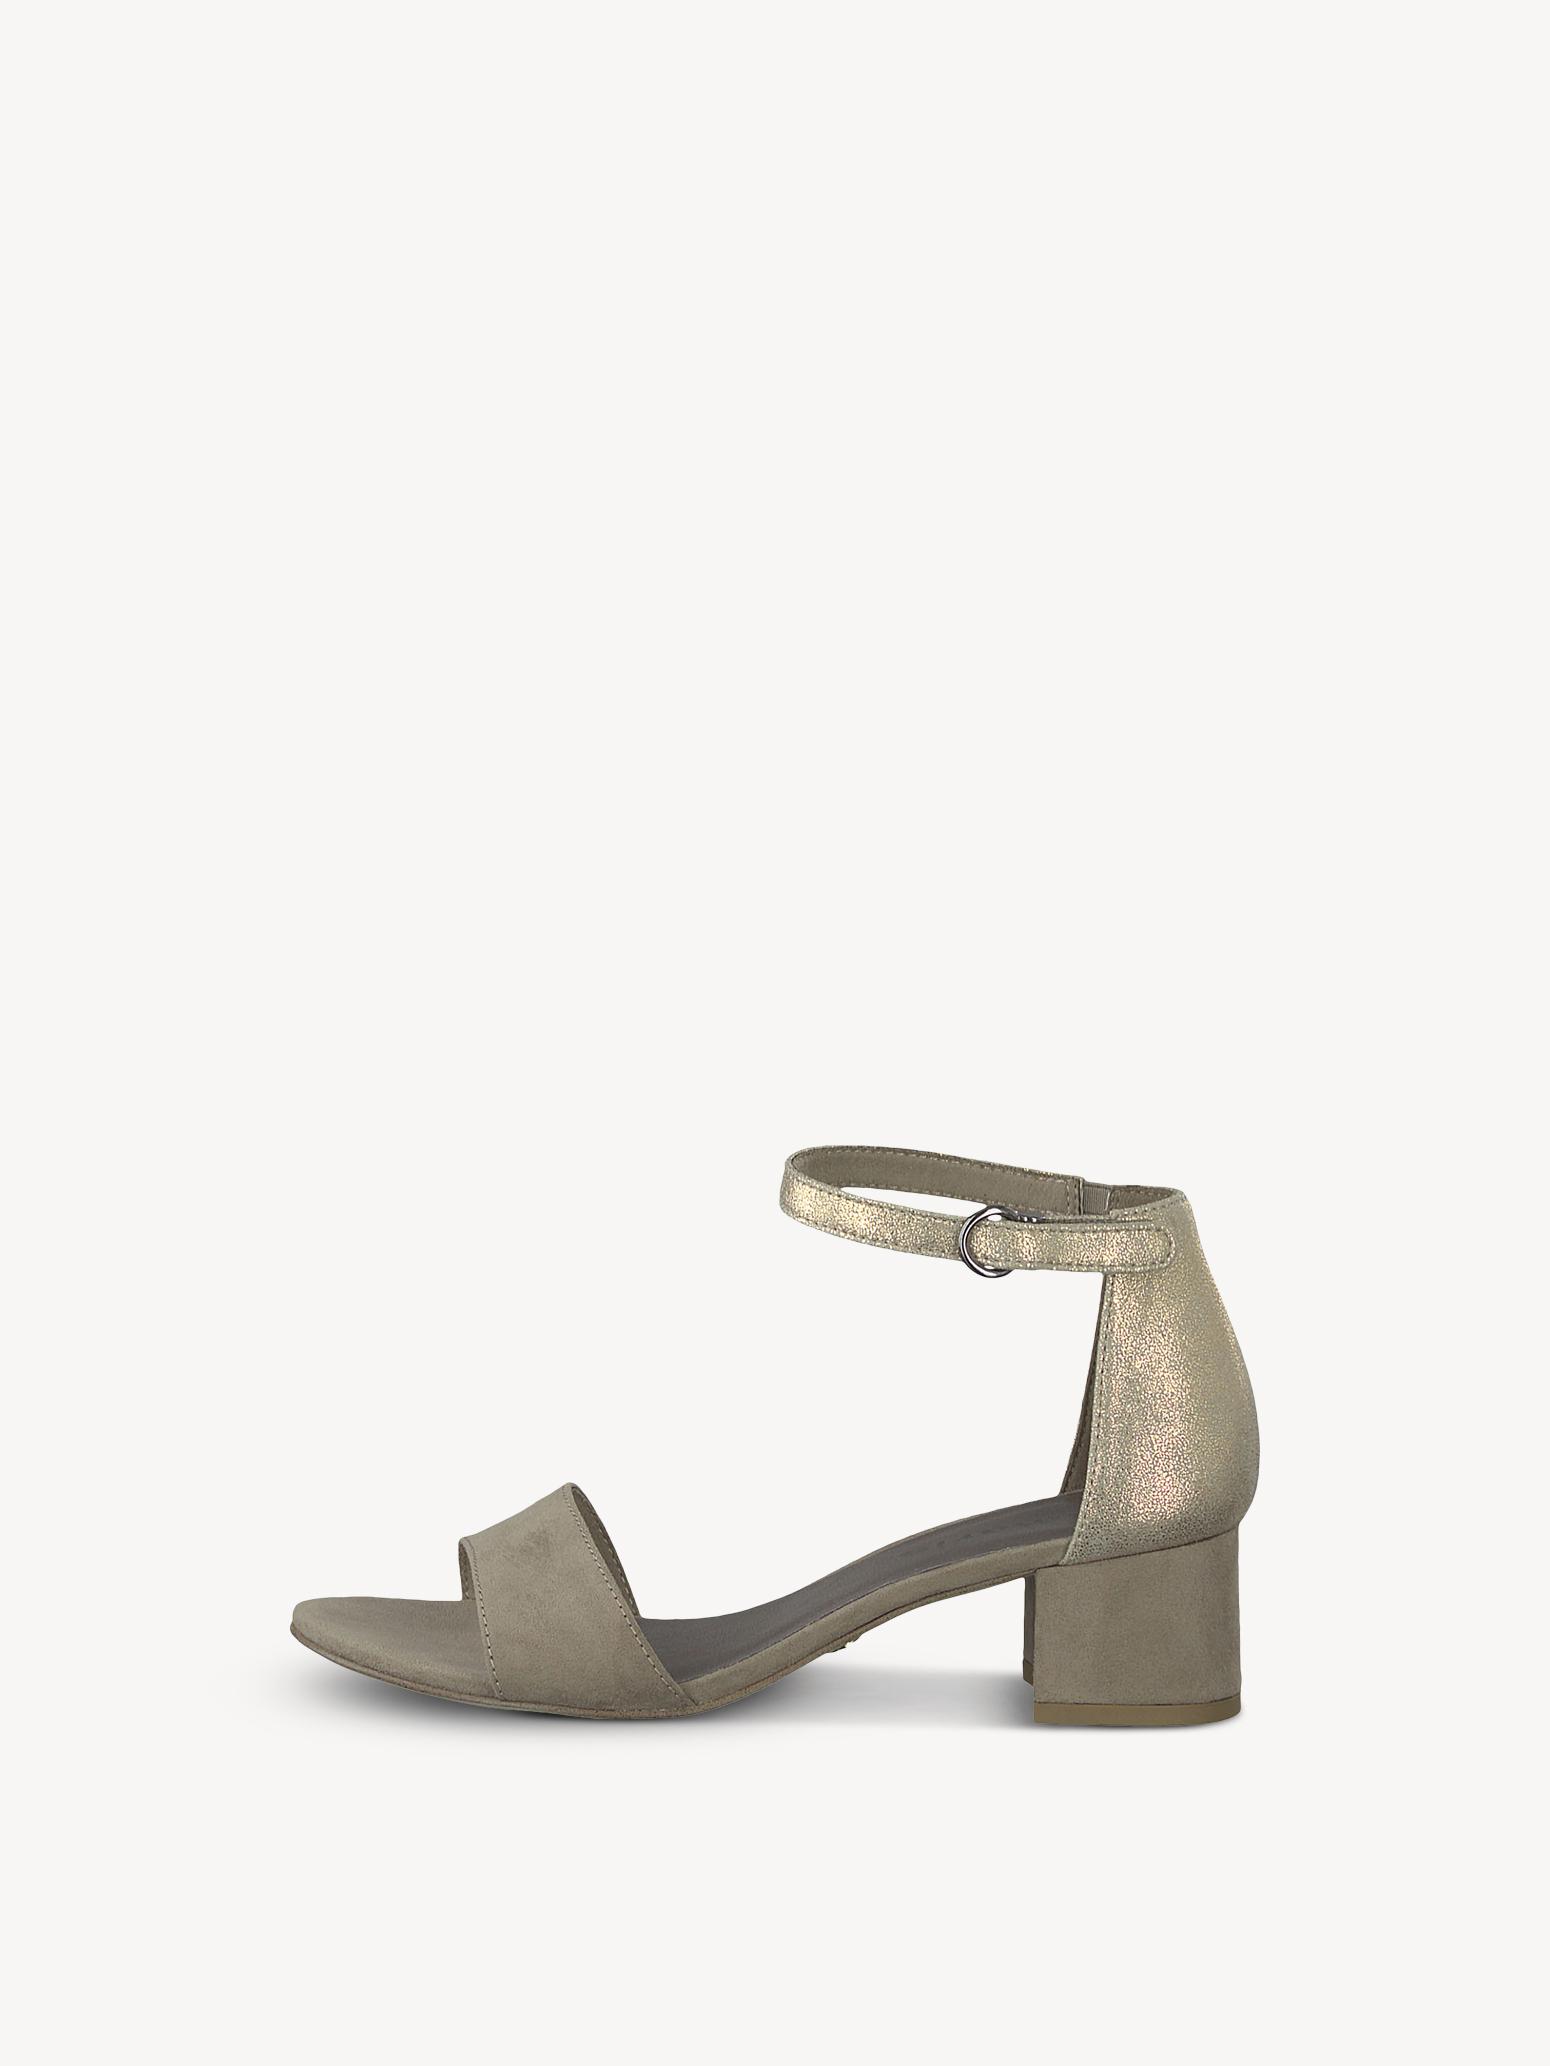 Sandalen sandaletten sandaletten Tamaris 42 42 Eur Tamaris